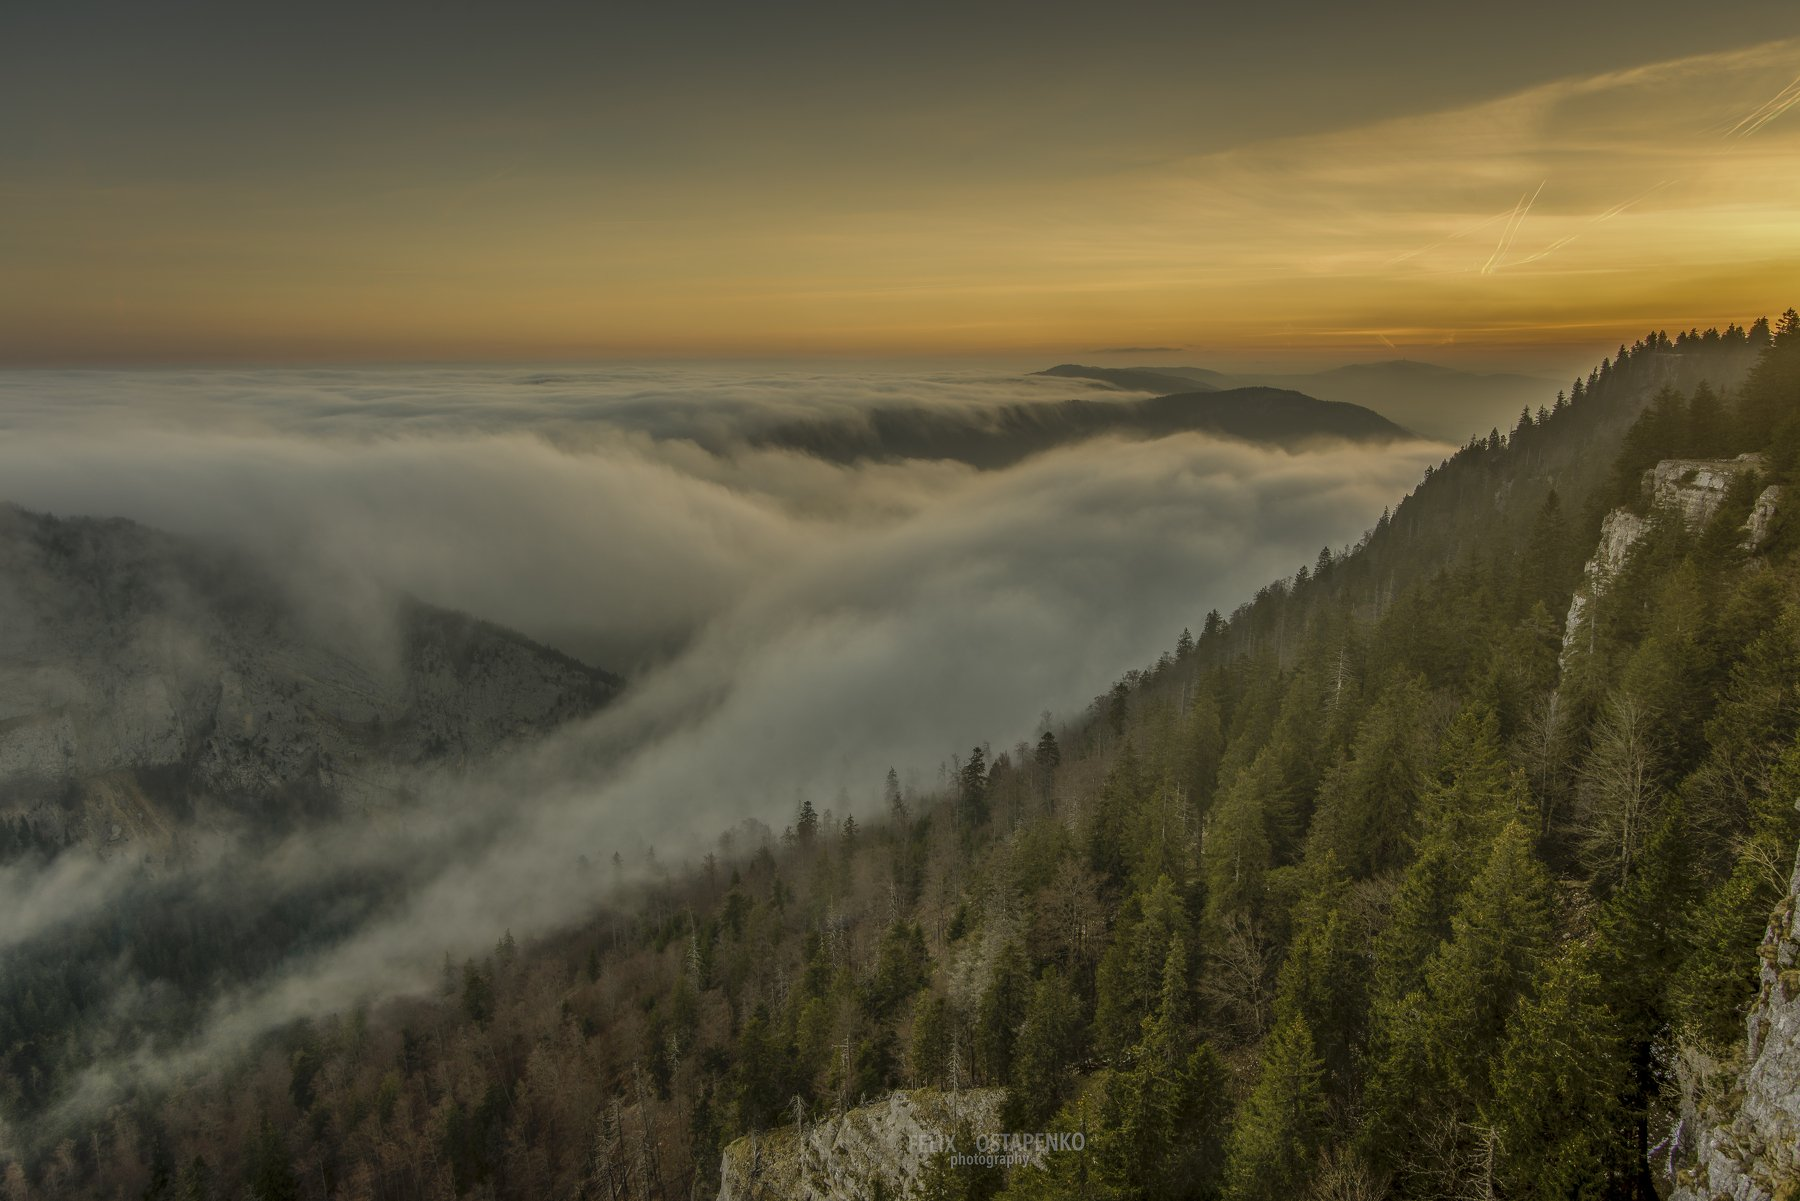 creux du van,switzerland,montains,sunrise,canyon,clouds, Felix Ostapenko